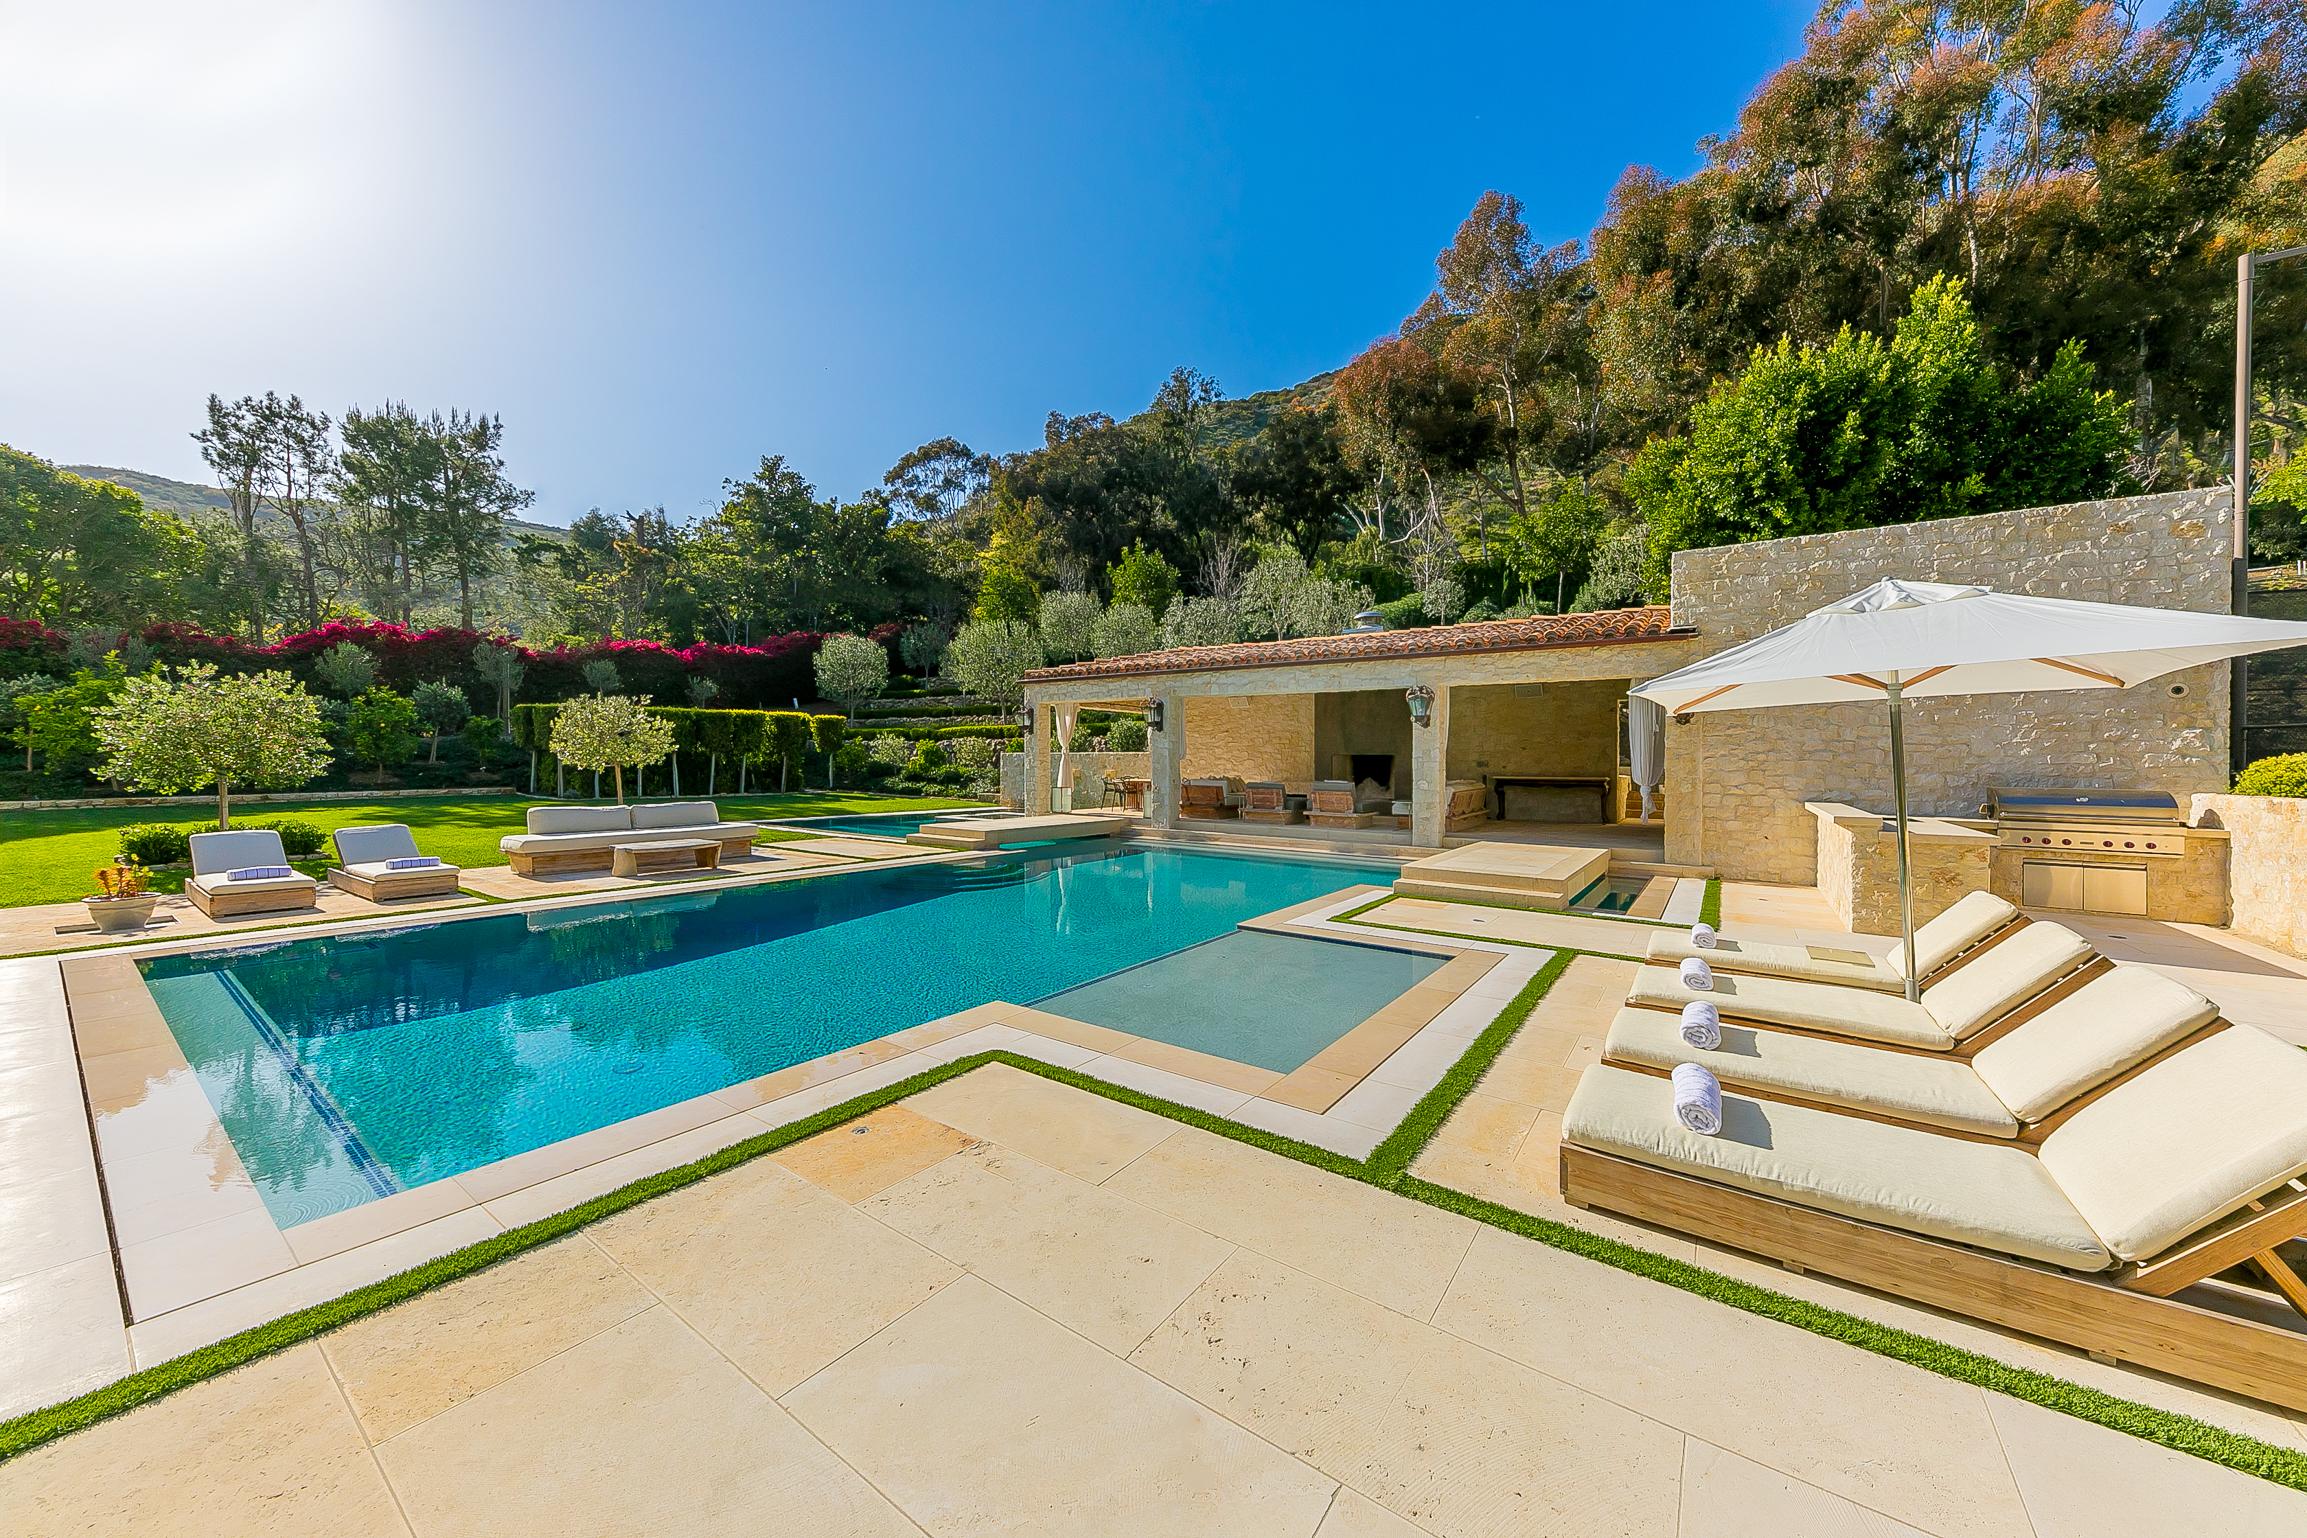 Malibu home viewed by Prince Harry and Megan Markle